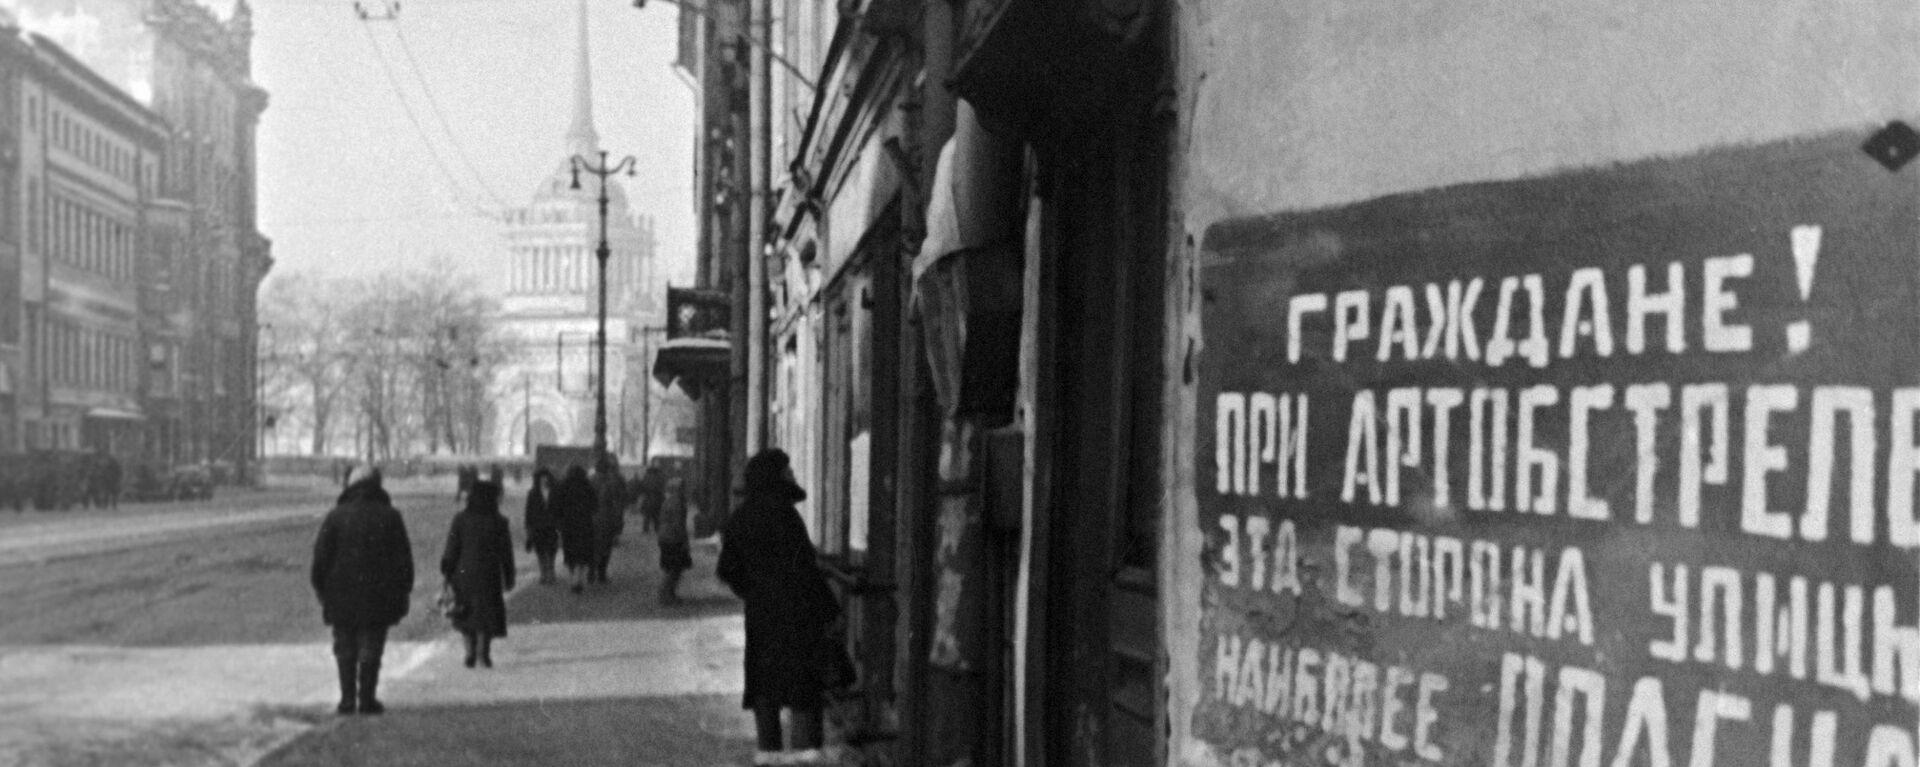 Blokada Leningradu - Sputnik Polska, 1920, 30.06.2021